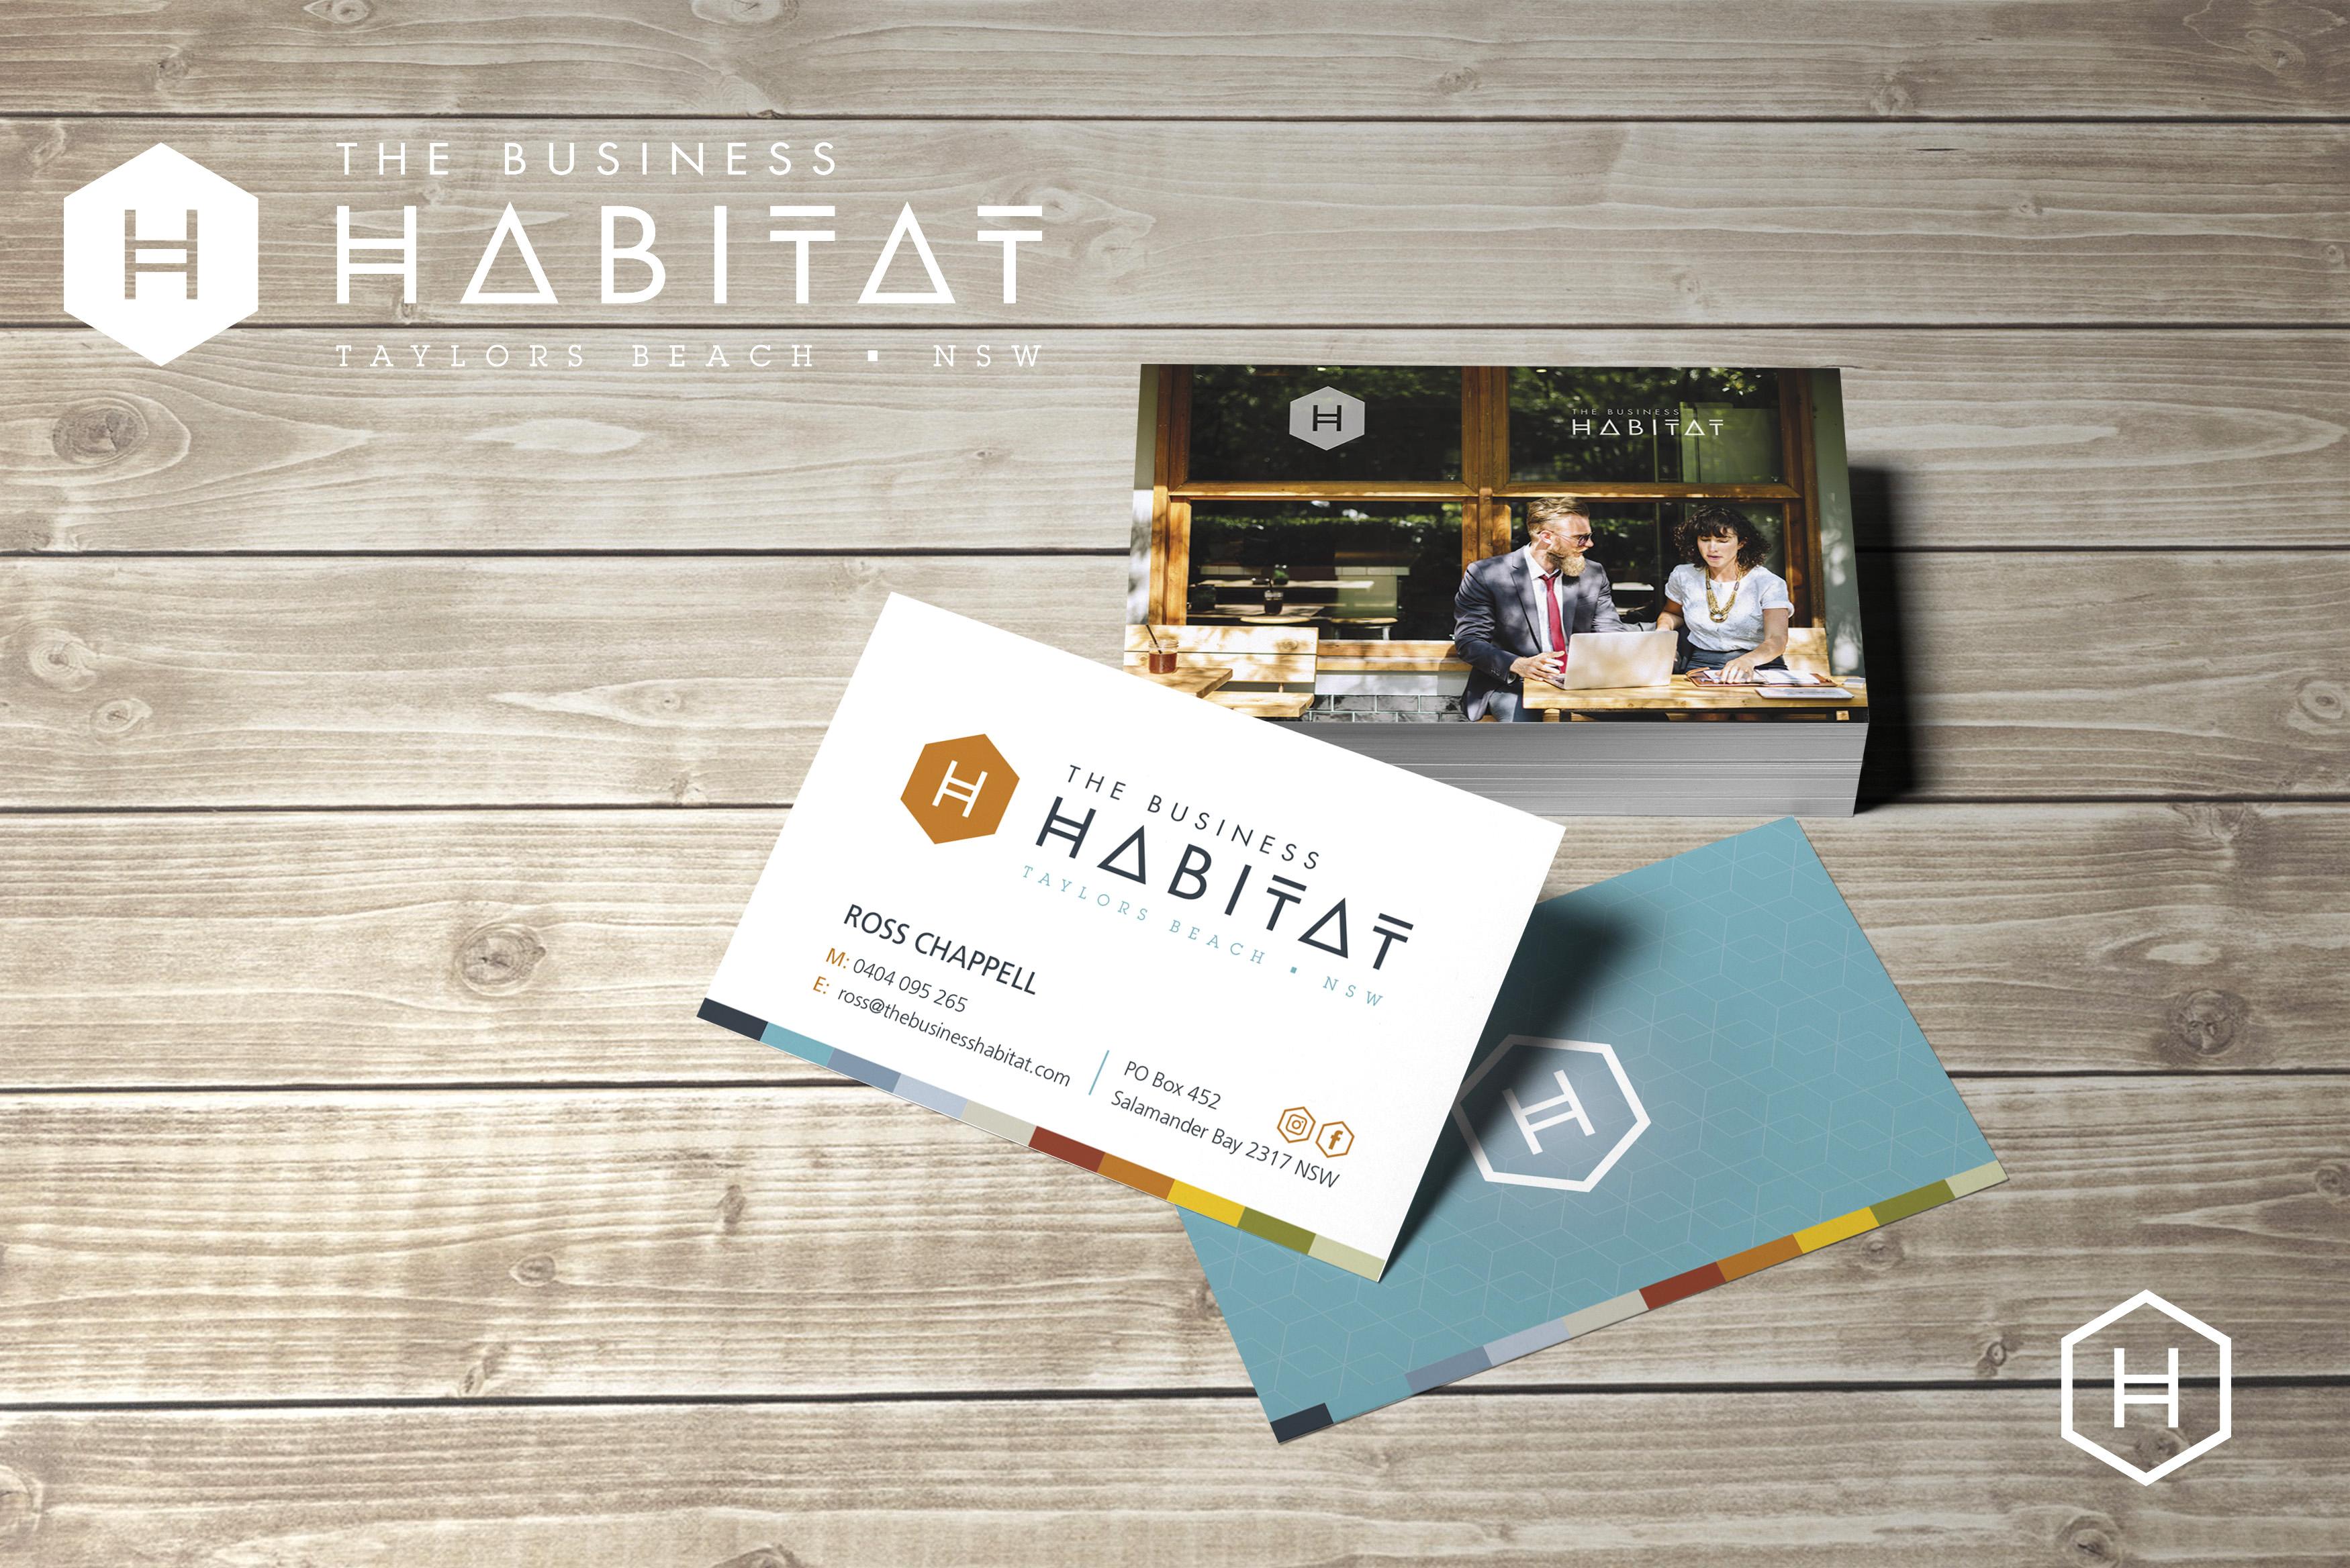 The Business Habitat